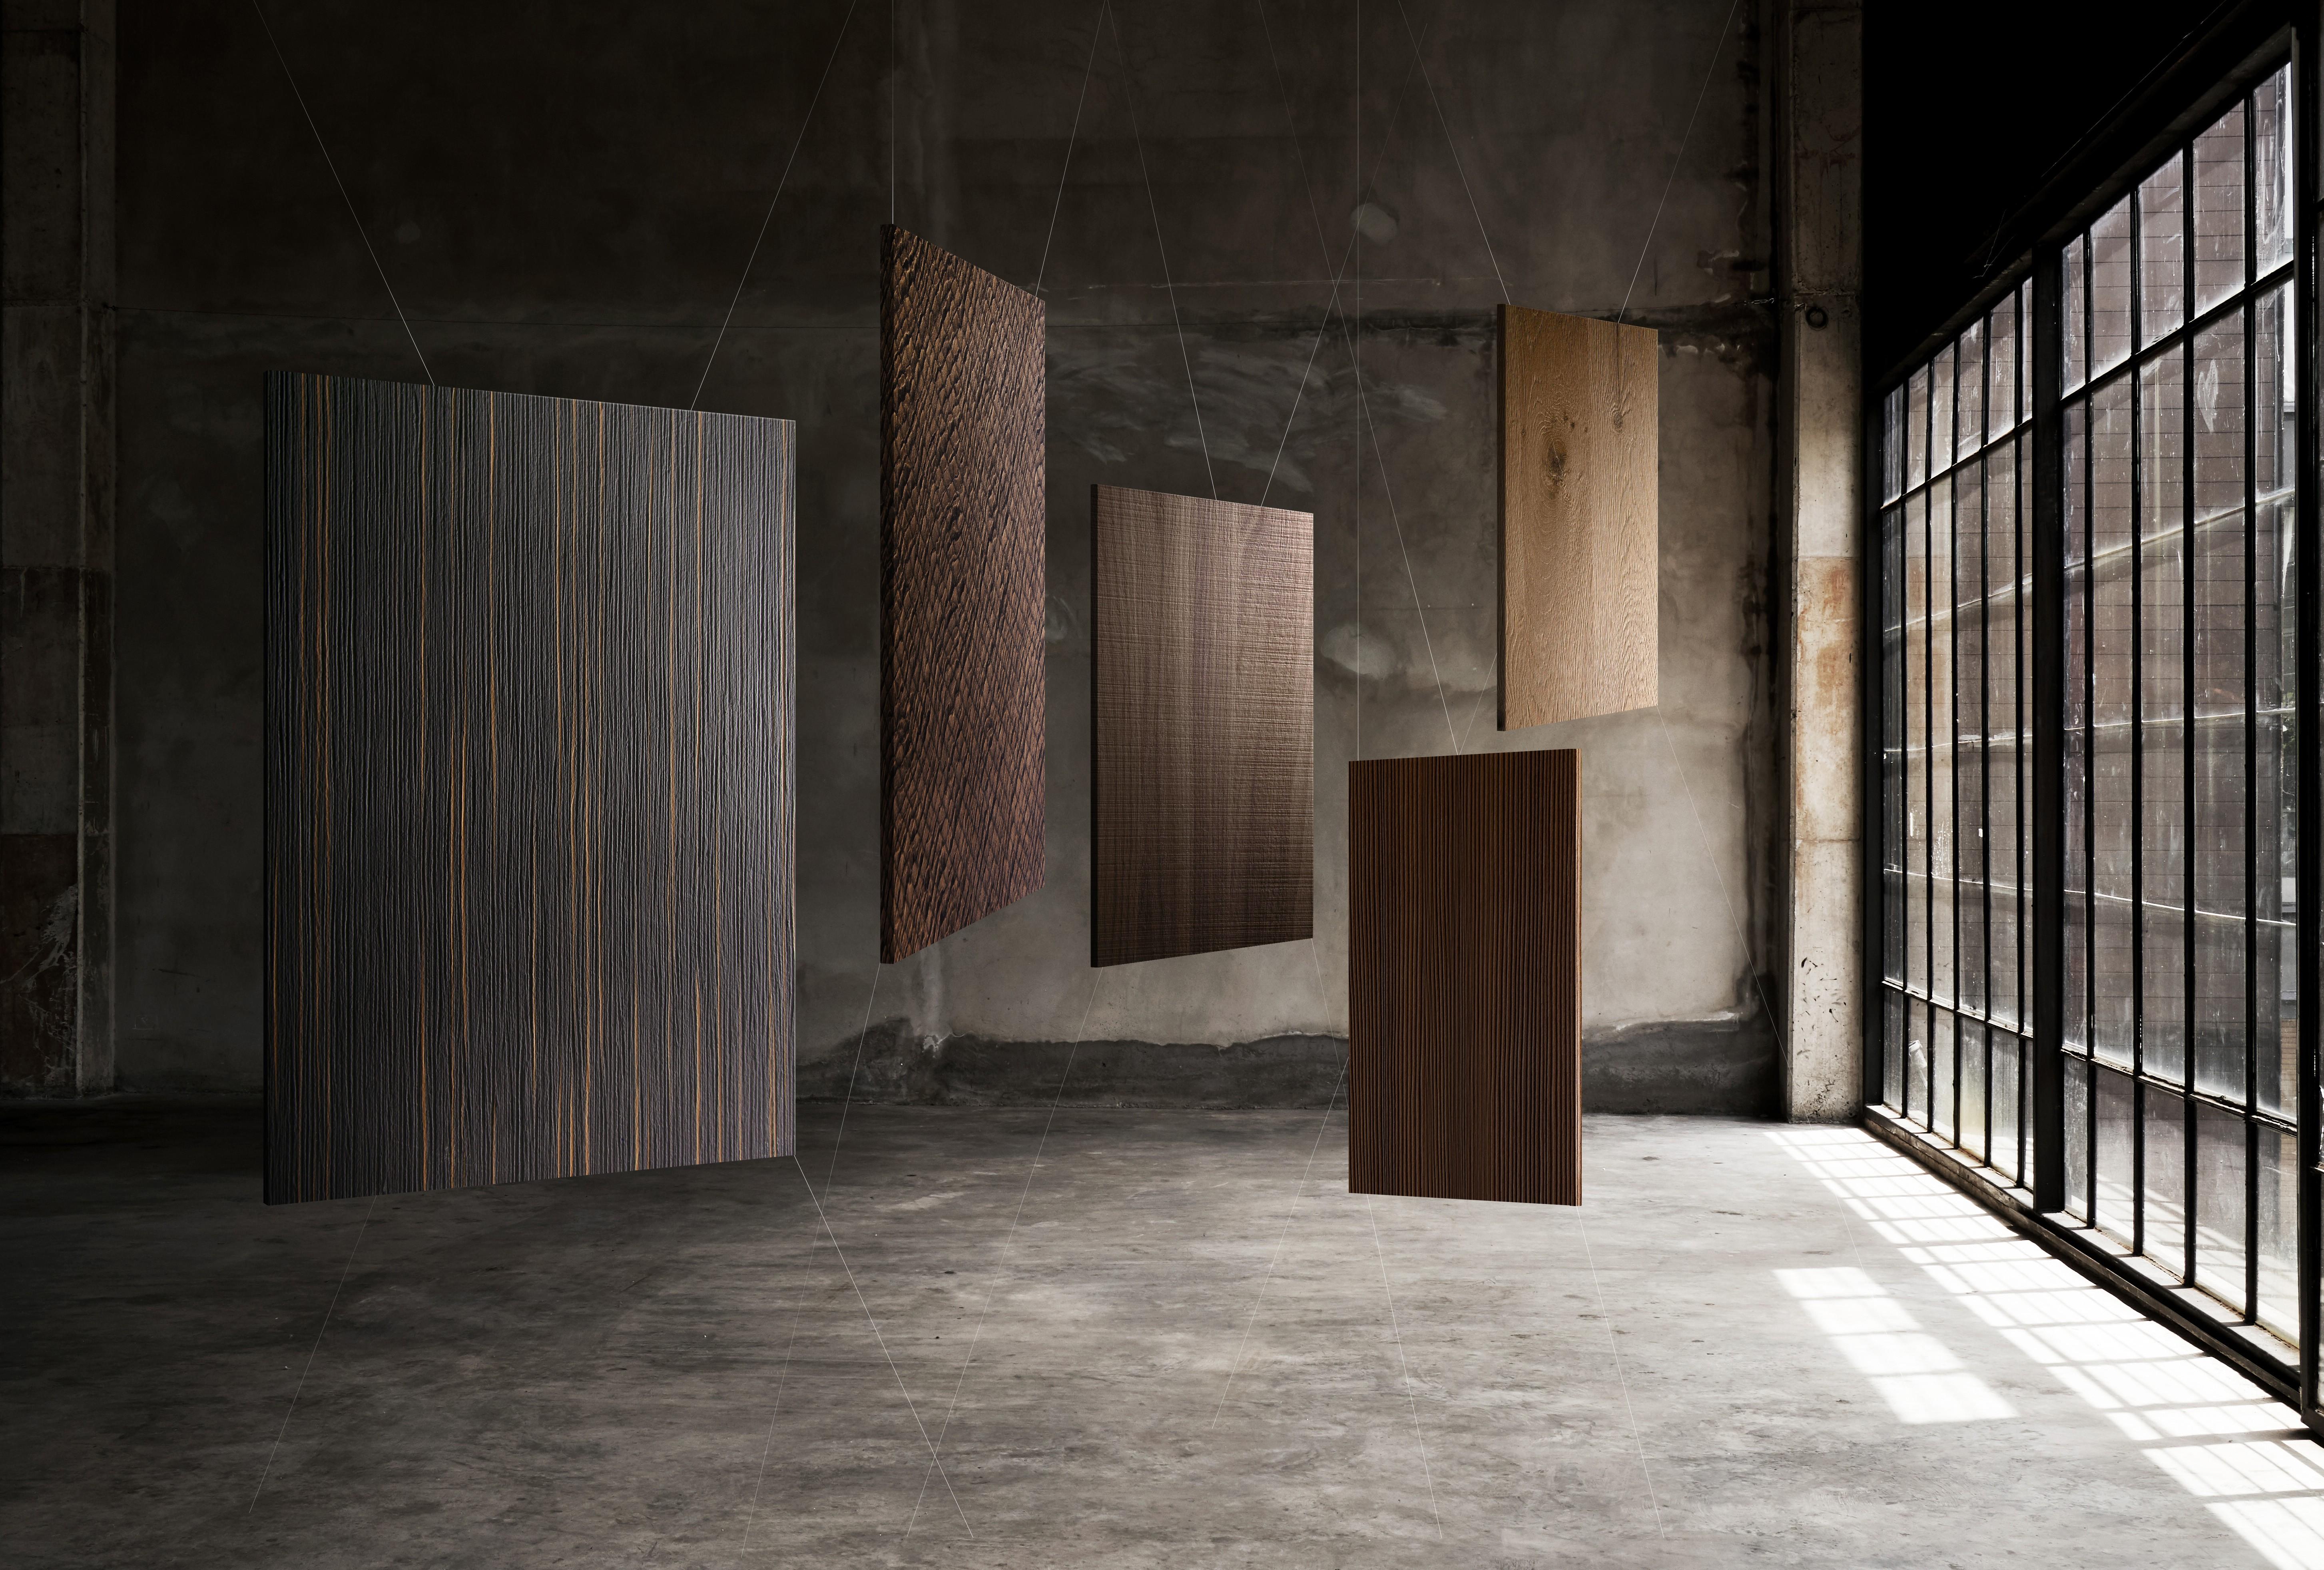 Offerte Lavoro Architetto Treviso xilia | wood experience | linkedin